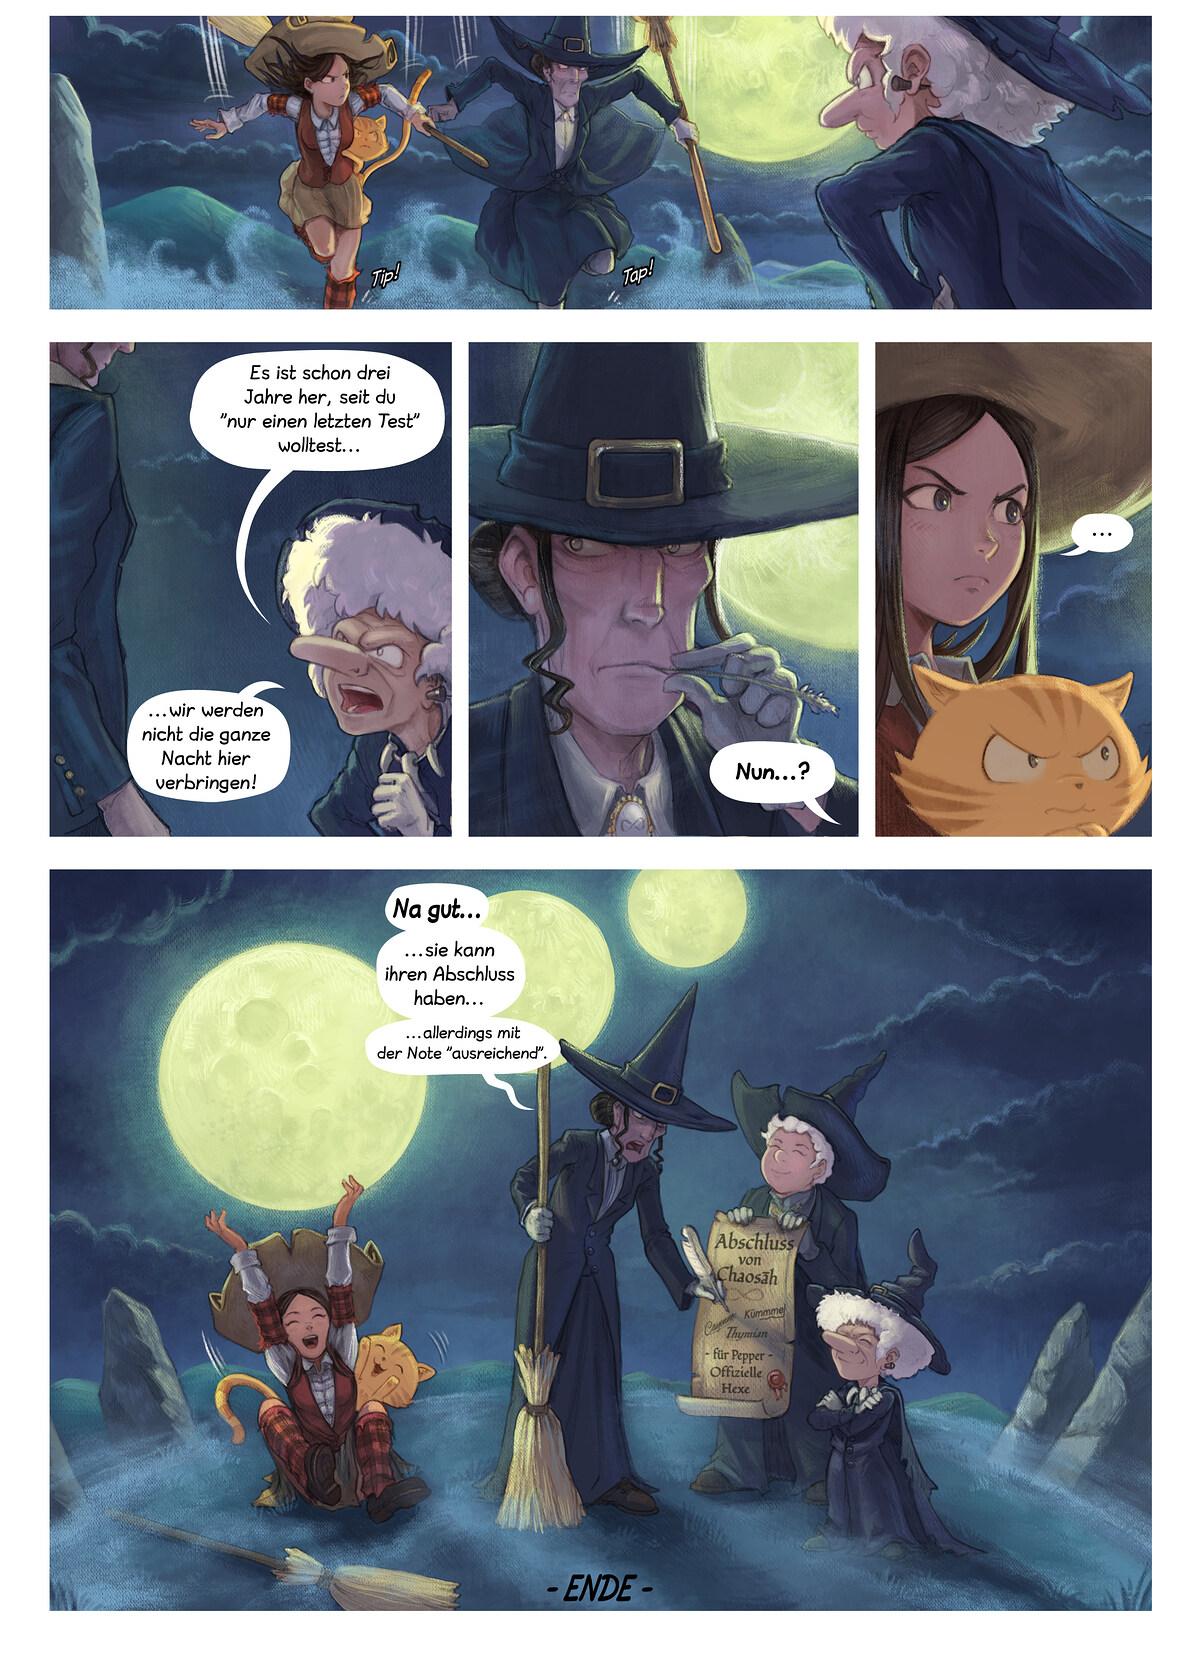 Episode 31: Der Kampf, Page 7